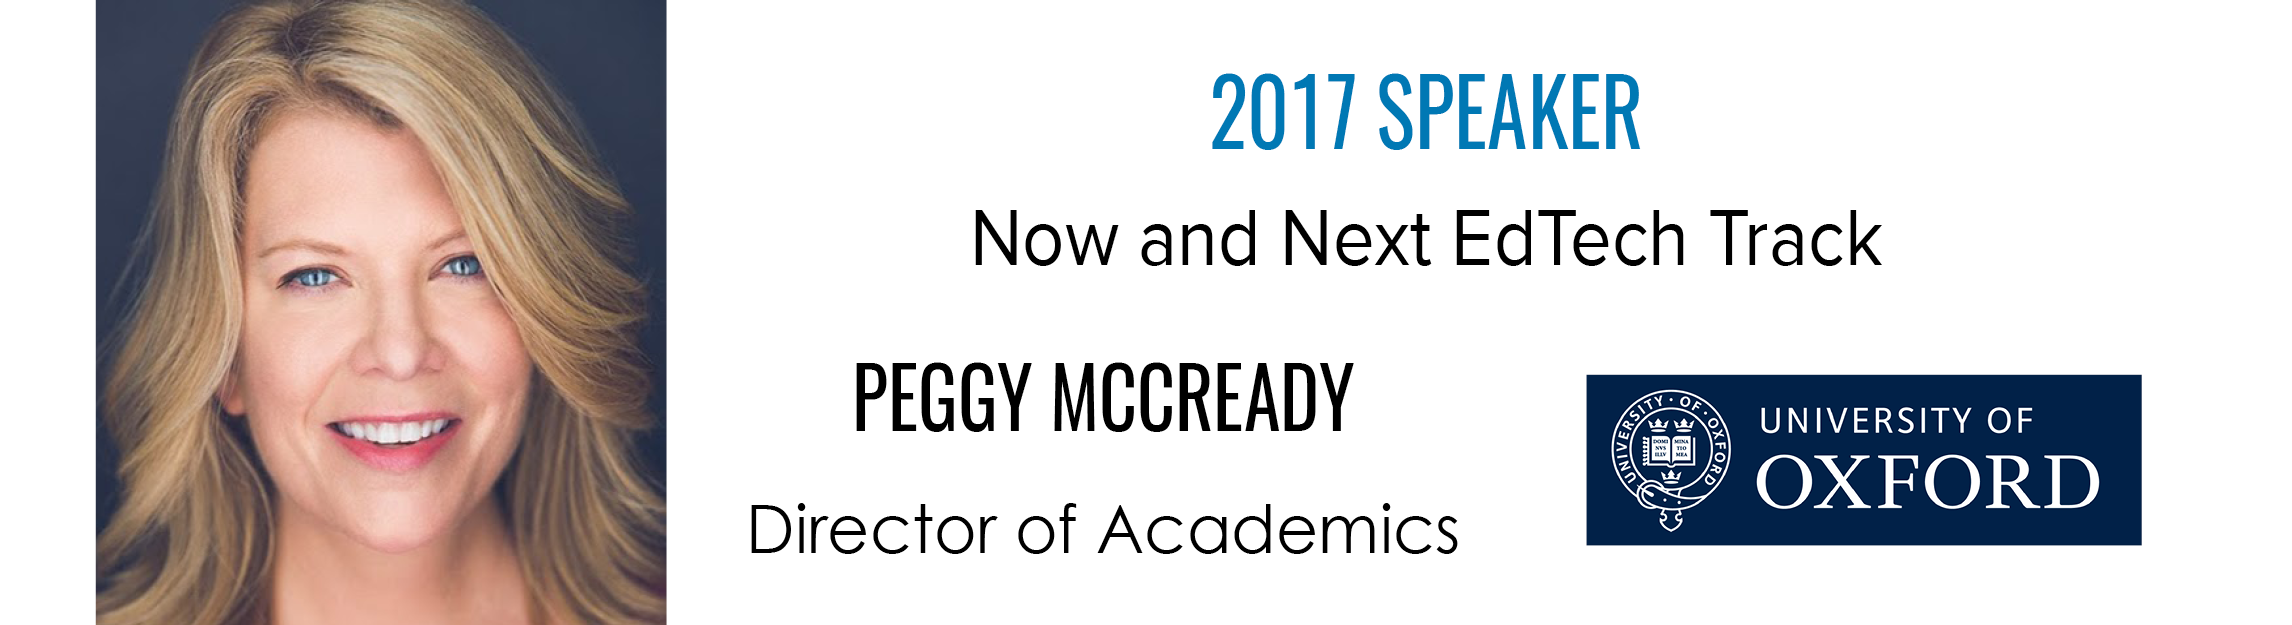 Peggy McCready_UofOxford.png